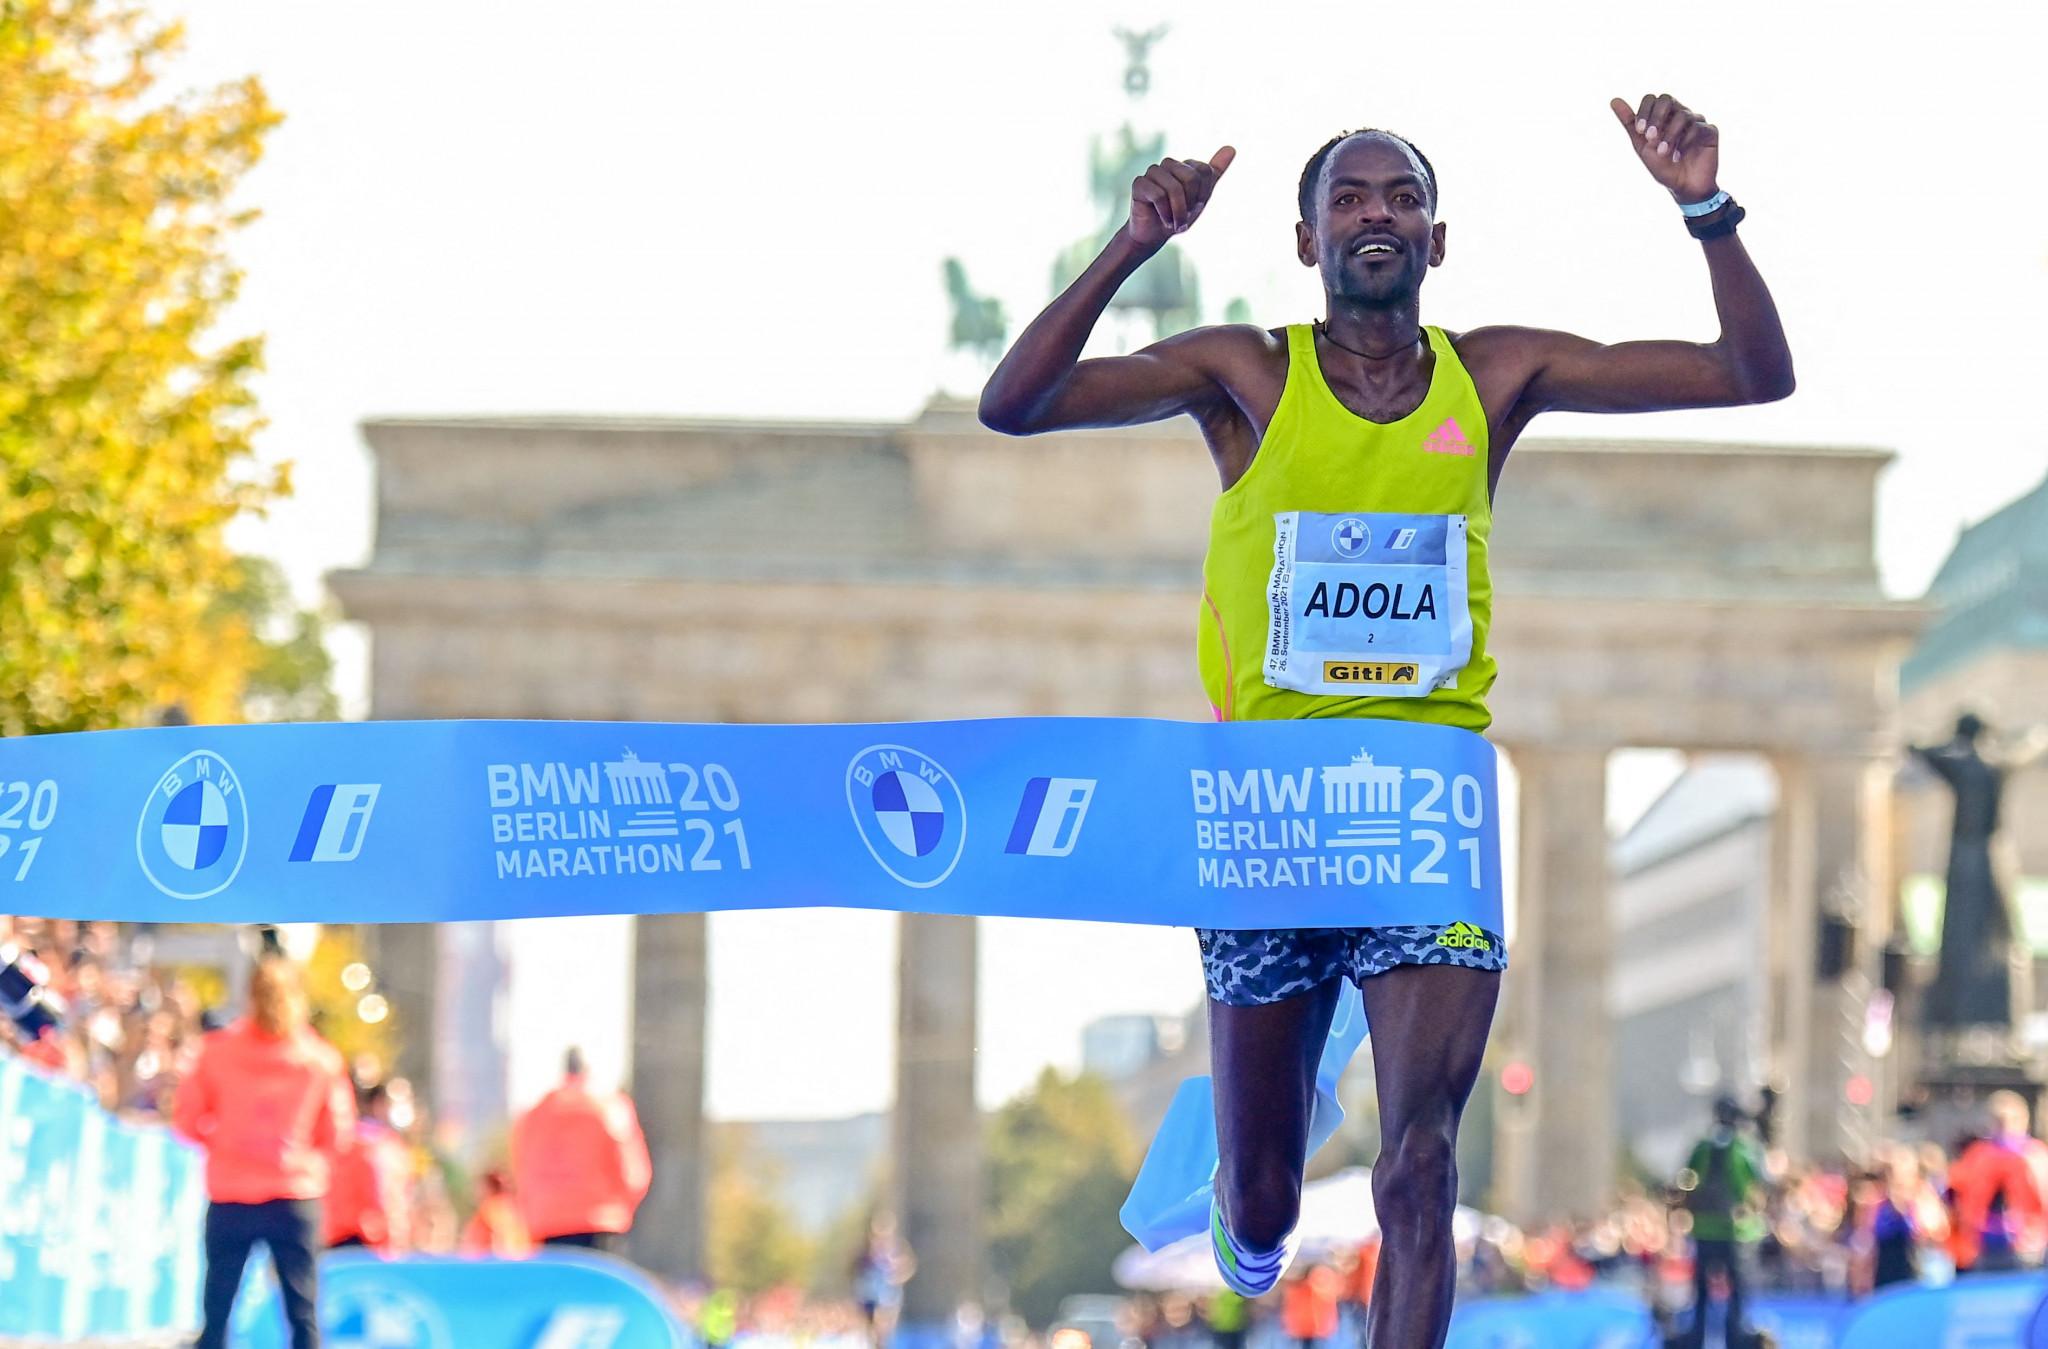 Adola and Gebreslase win at Berlin Marathon as Bekele fails to threaten world record